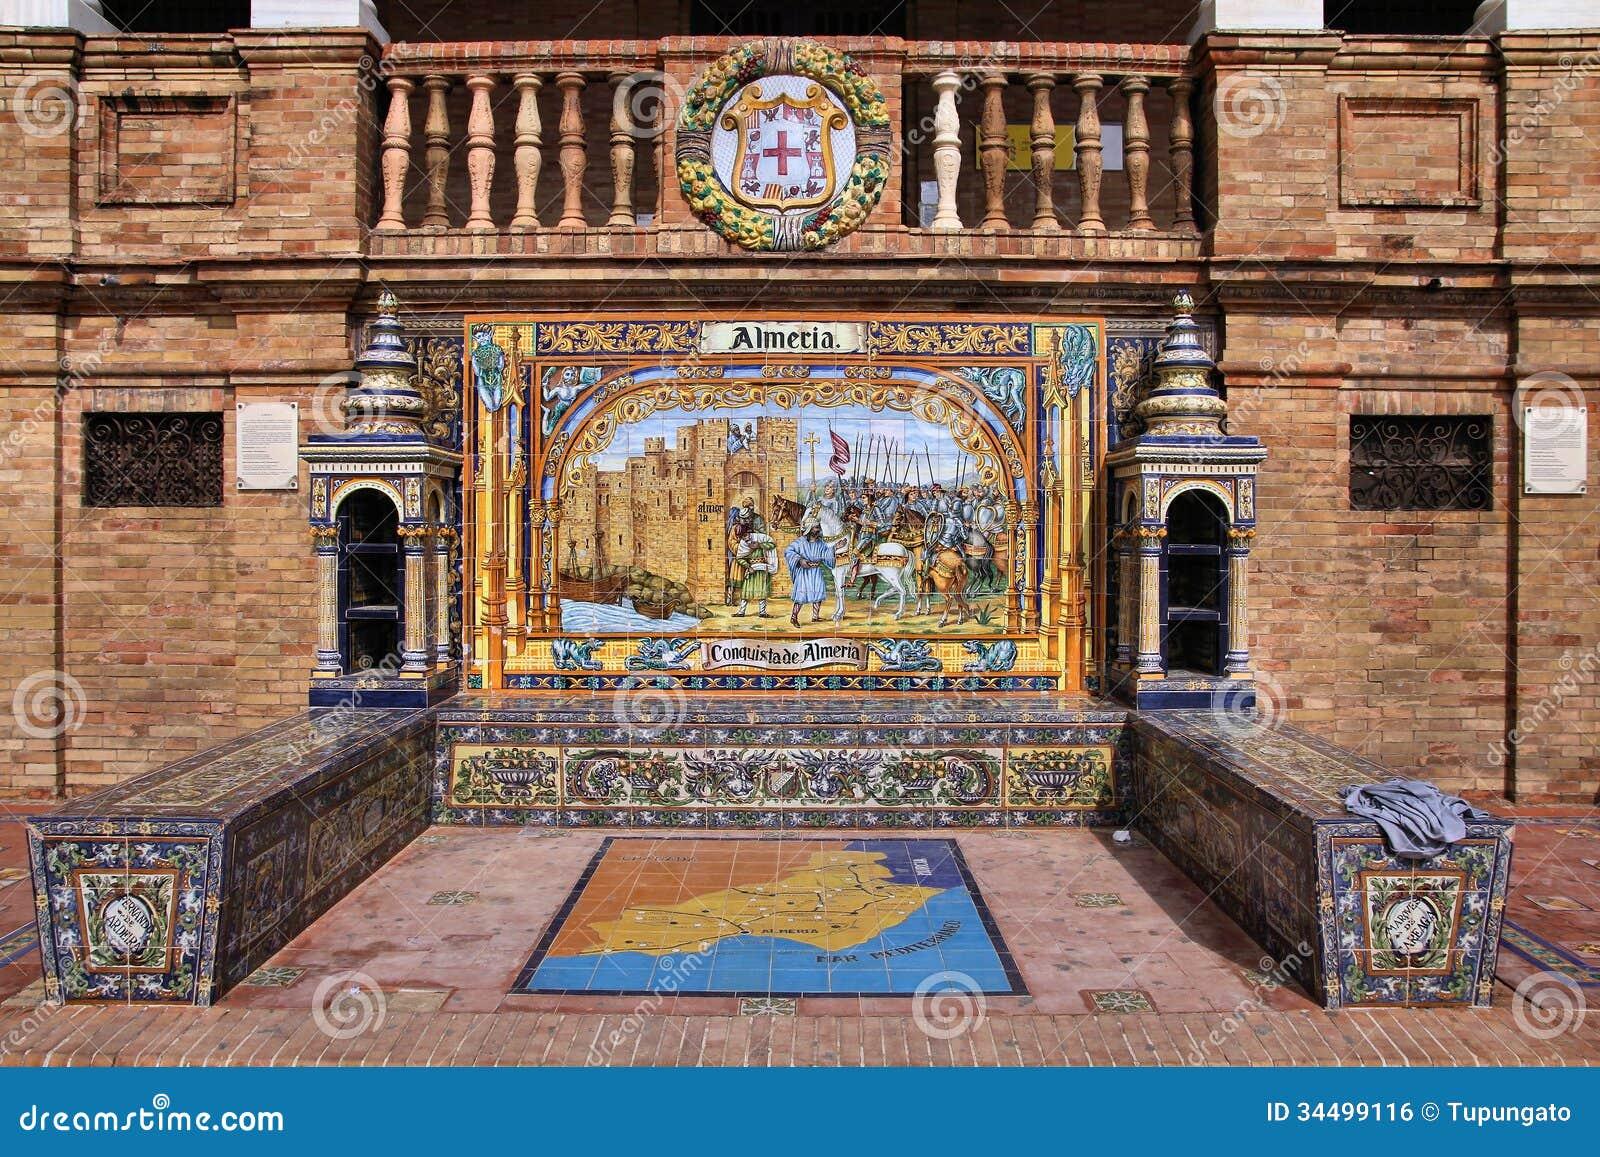 Almeria Alcove Stock Photo Image Of Europe Tile